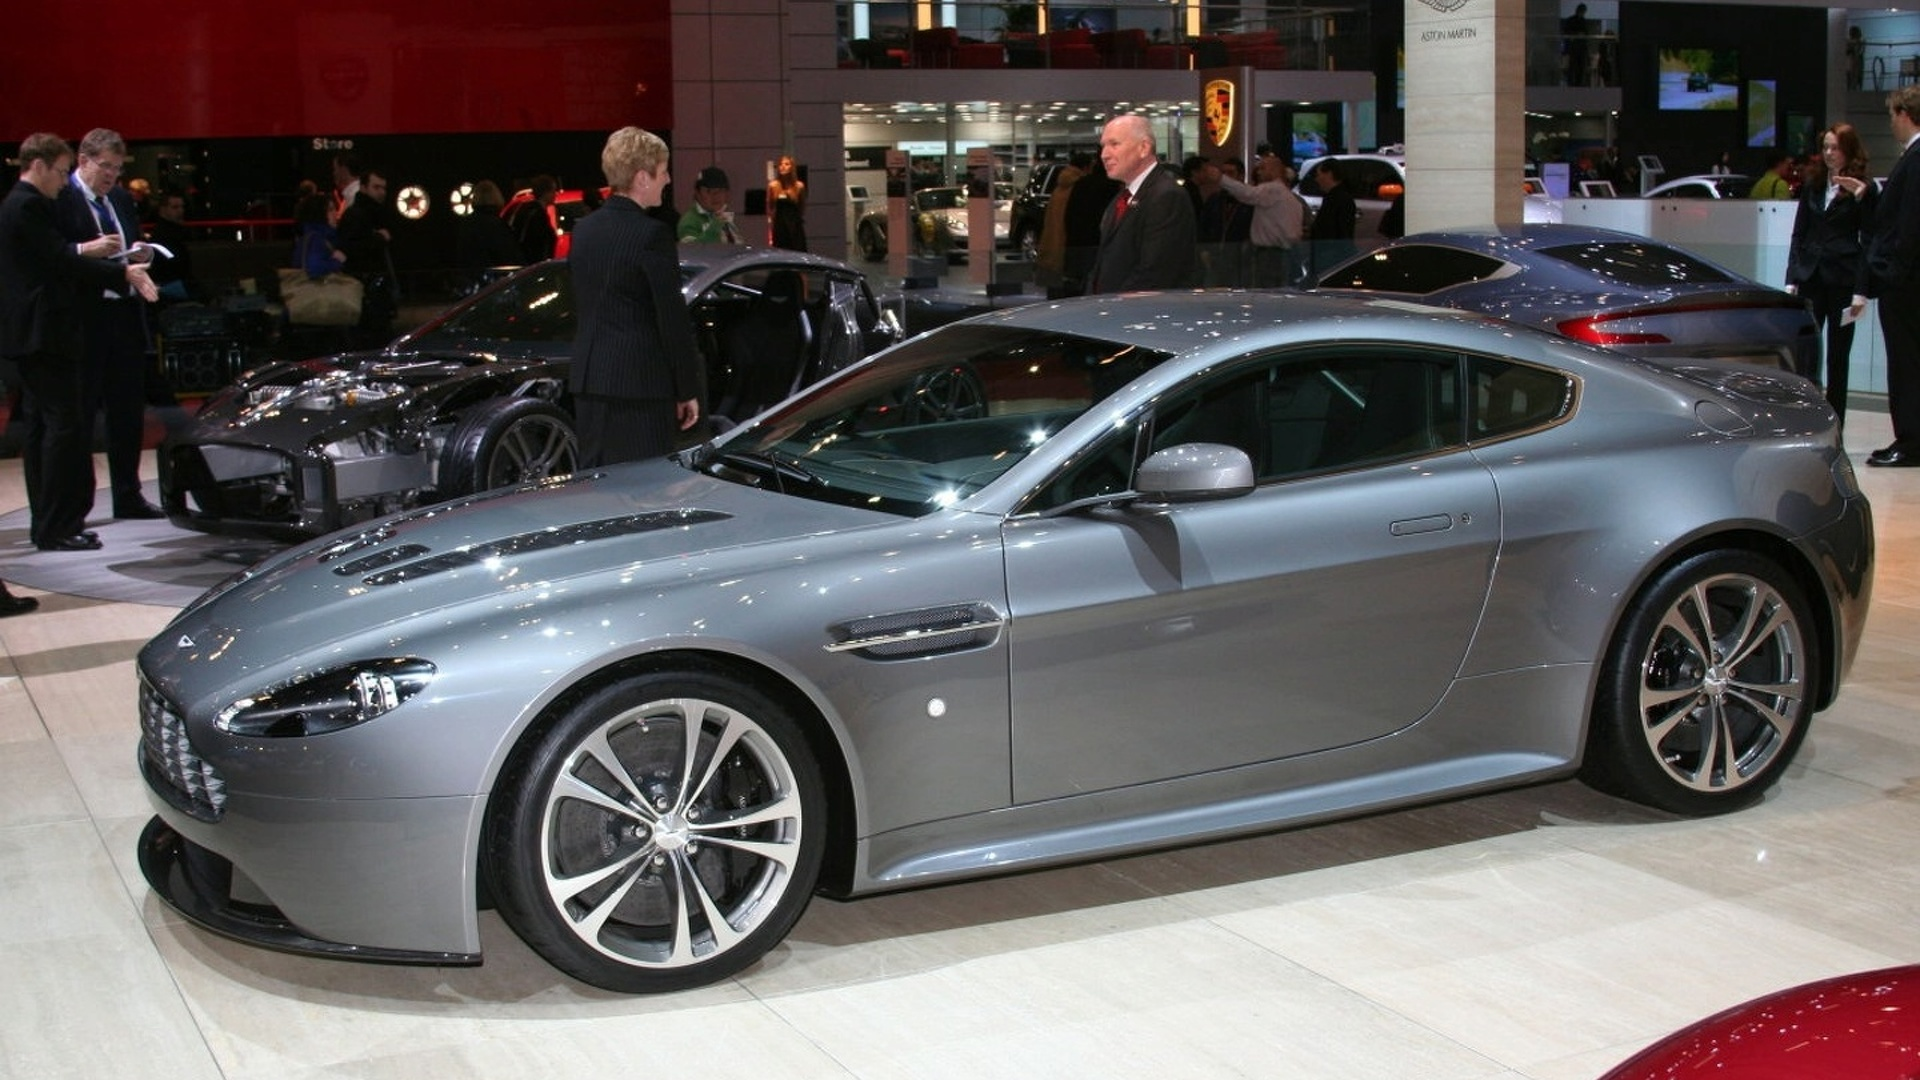 Aston Martin V Vantage News And Reviews Motorcom UK - 2018 aston martin v8 vantage